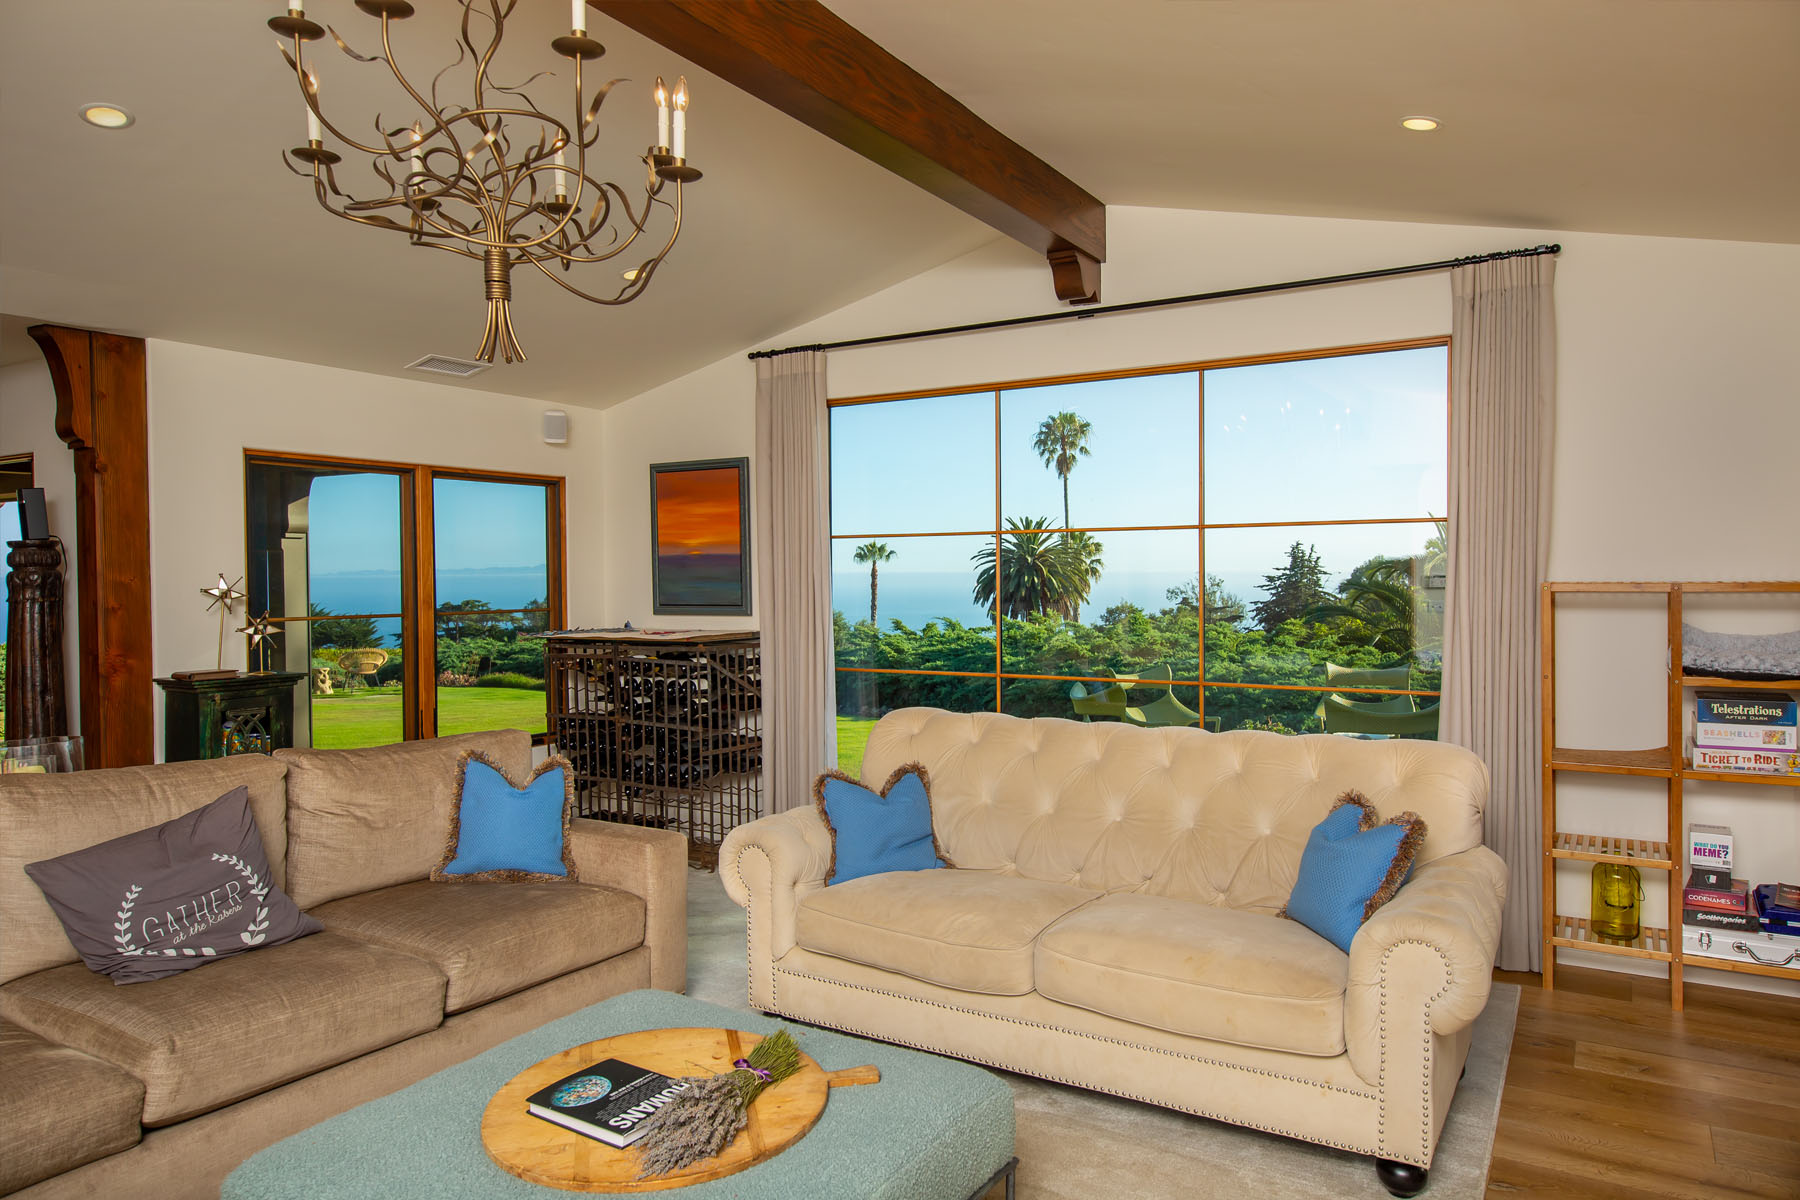 Campanil living room